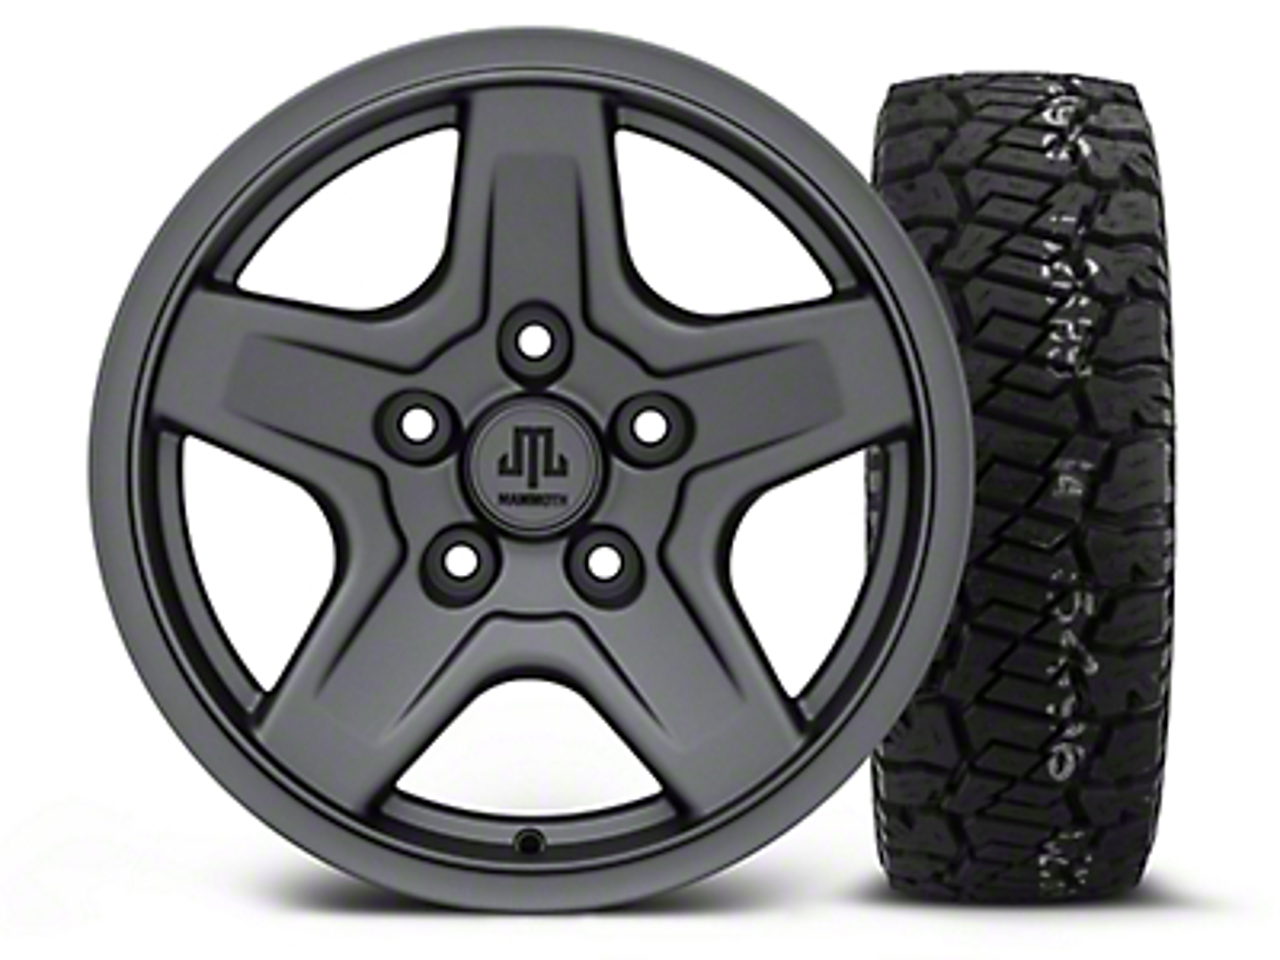 Mammoth Boulder Charcoal - 16x8 Wheel - and Dick Cepek Fun Country Tire - 285/75R16 (07-18 Jeep Wrangler JK; 2018 Jeep Wrangler JL)